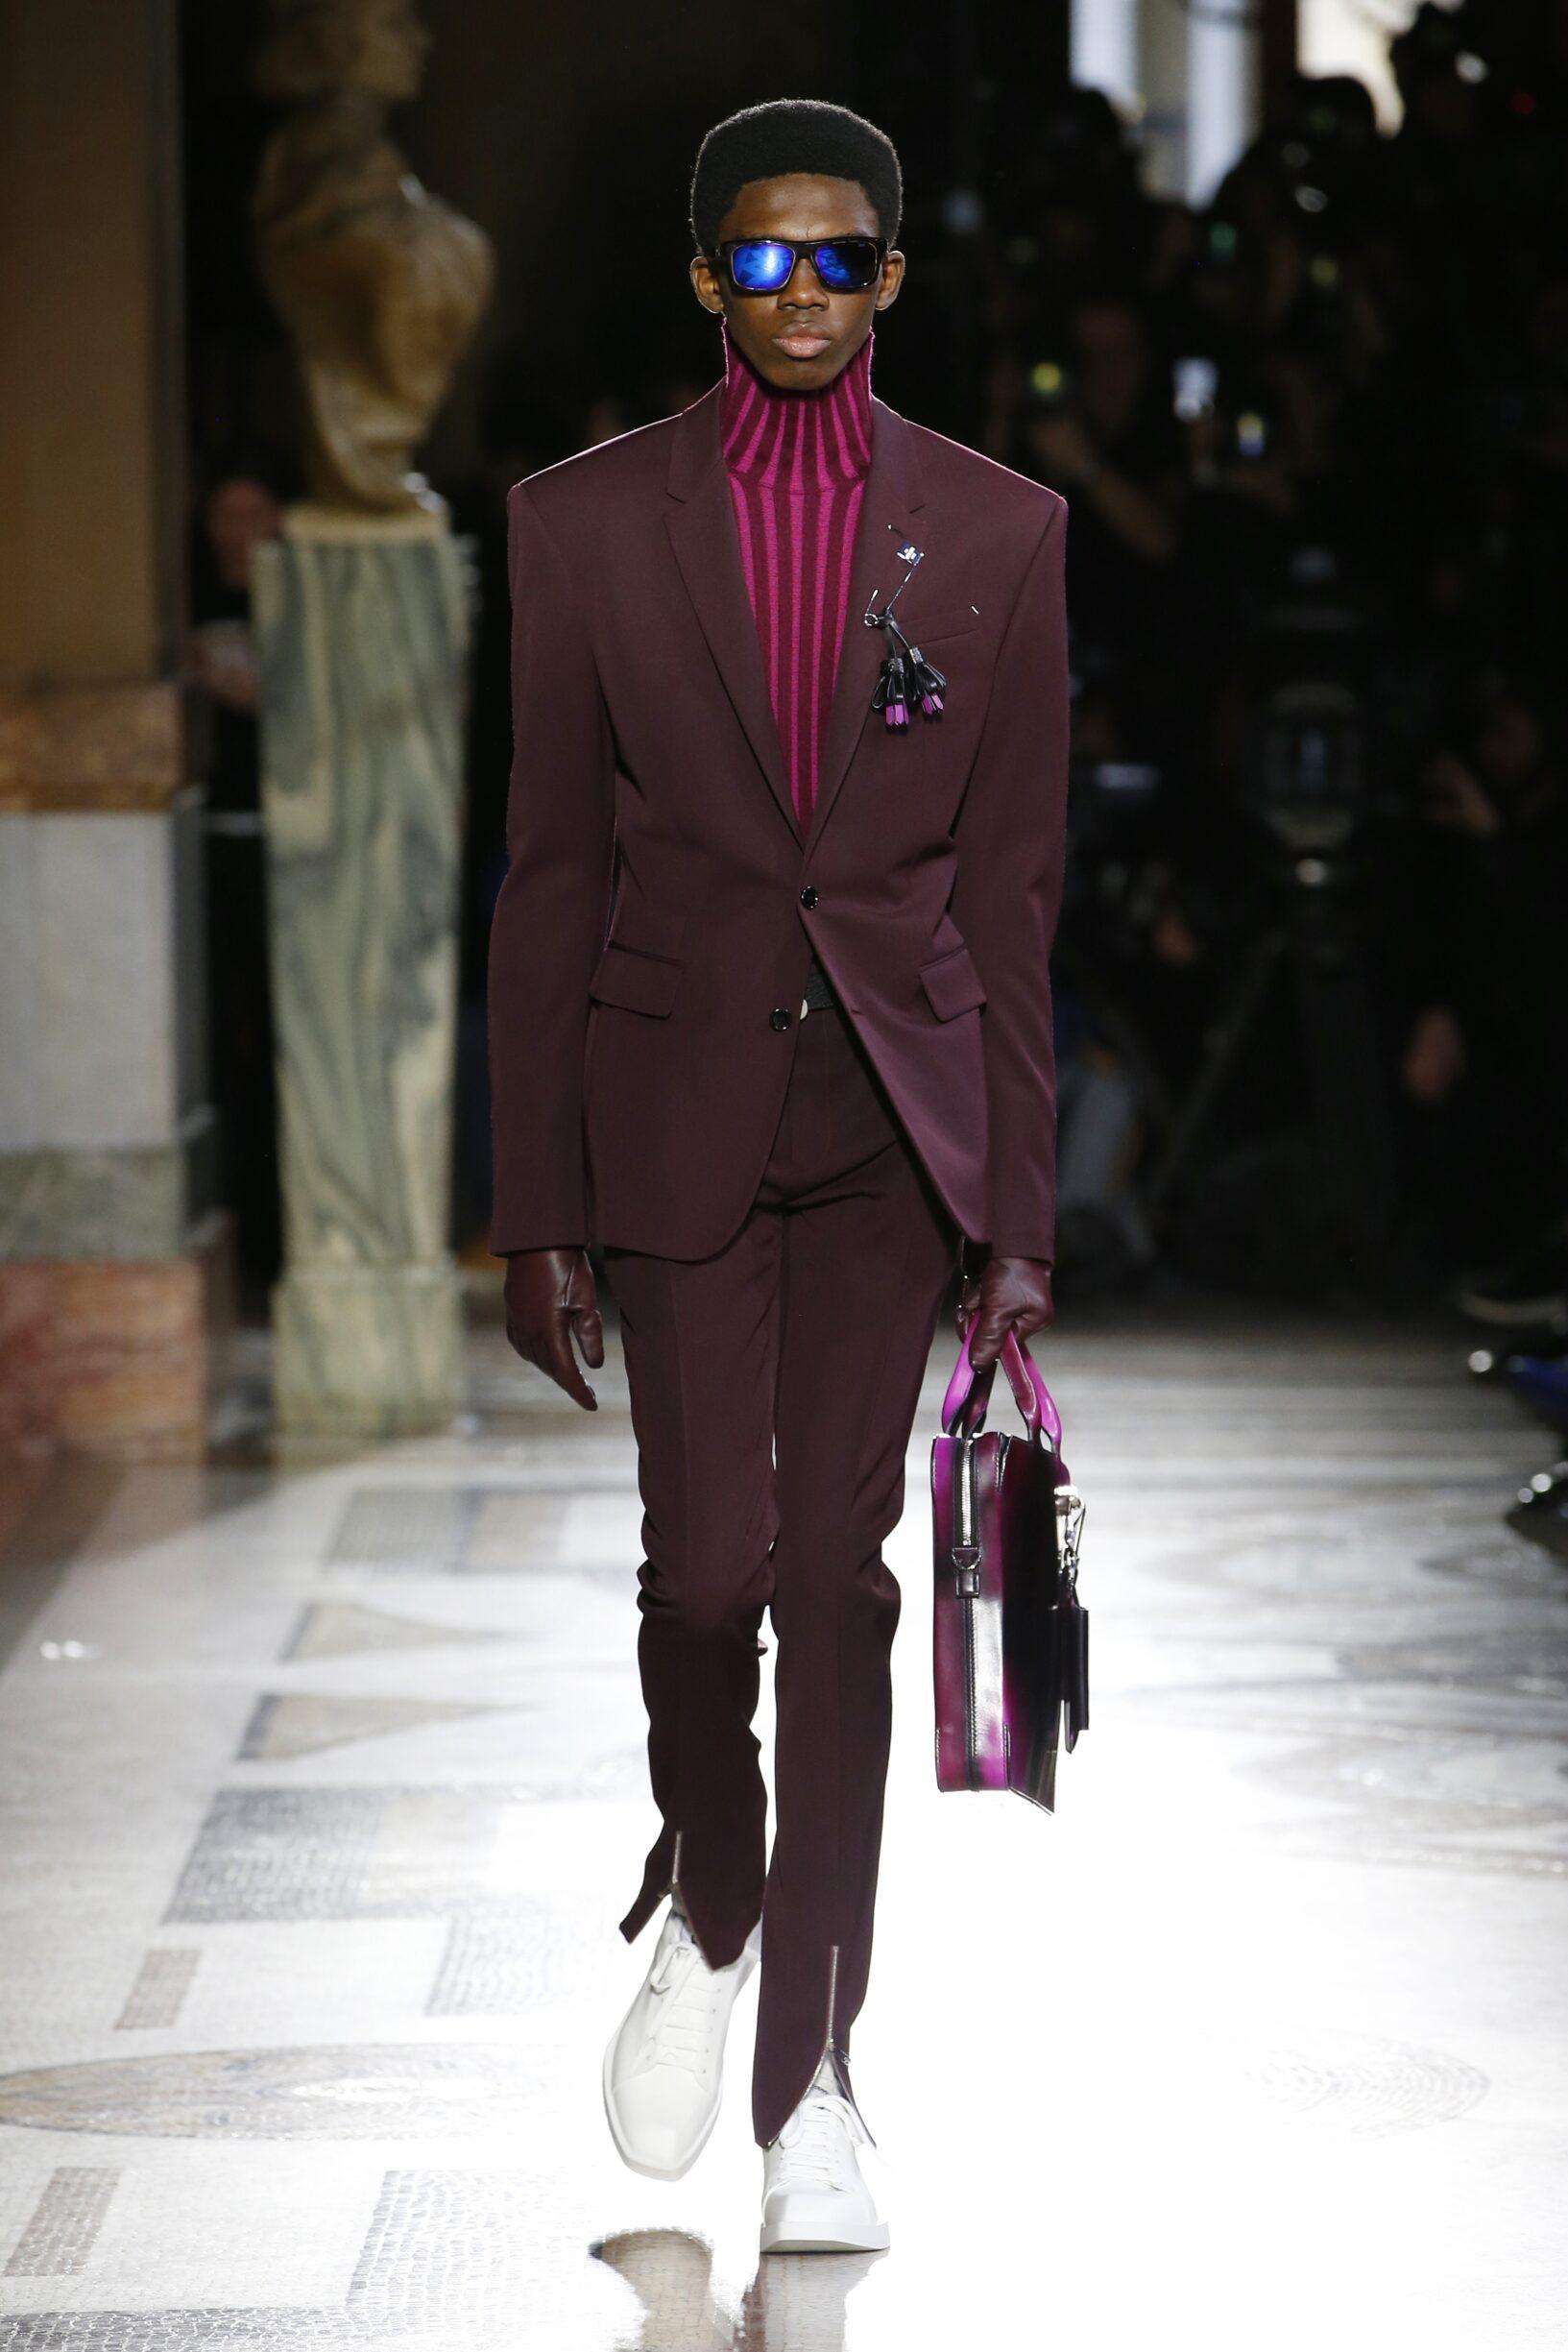 Fashion Model Berluti Catwalk